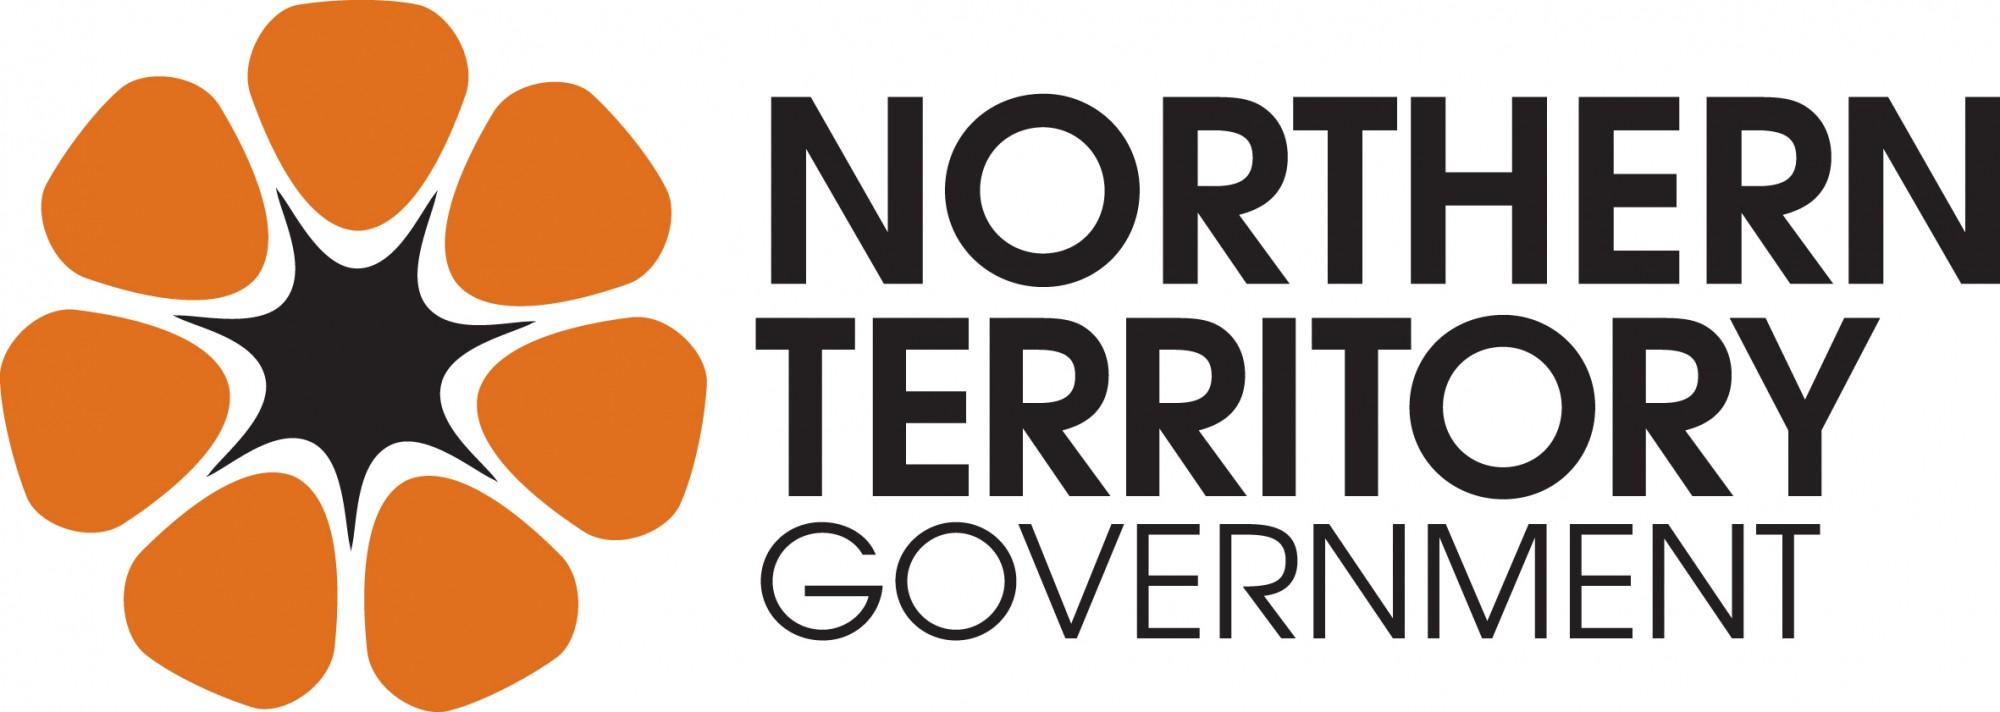 NT Government.jpg